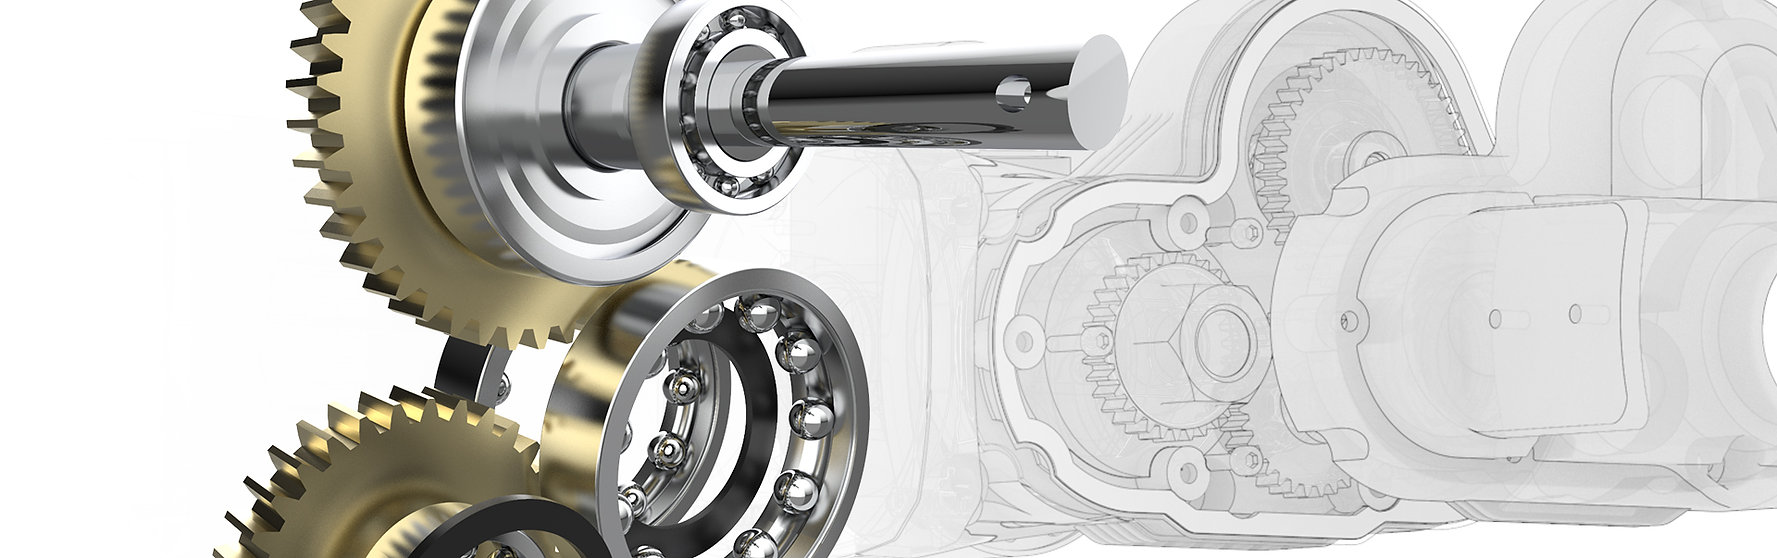 eisenblätter-getriebekonstruktion.jpg